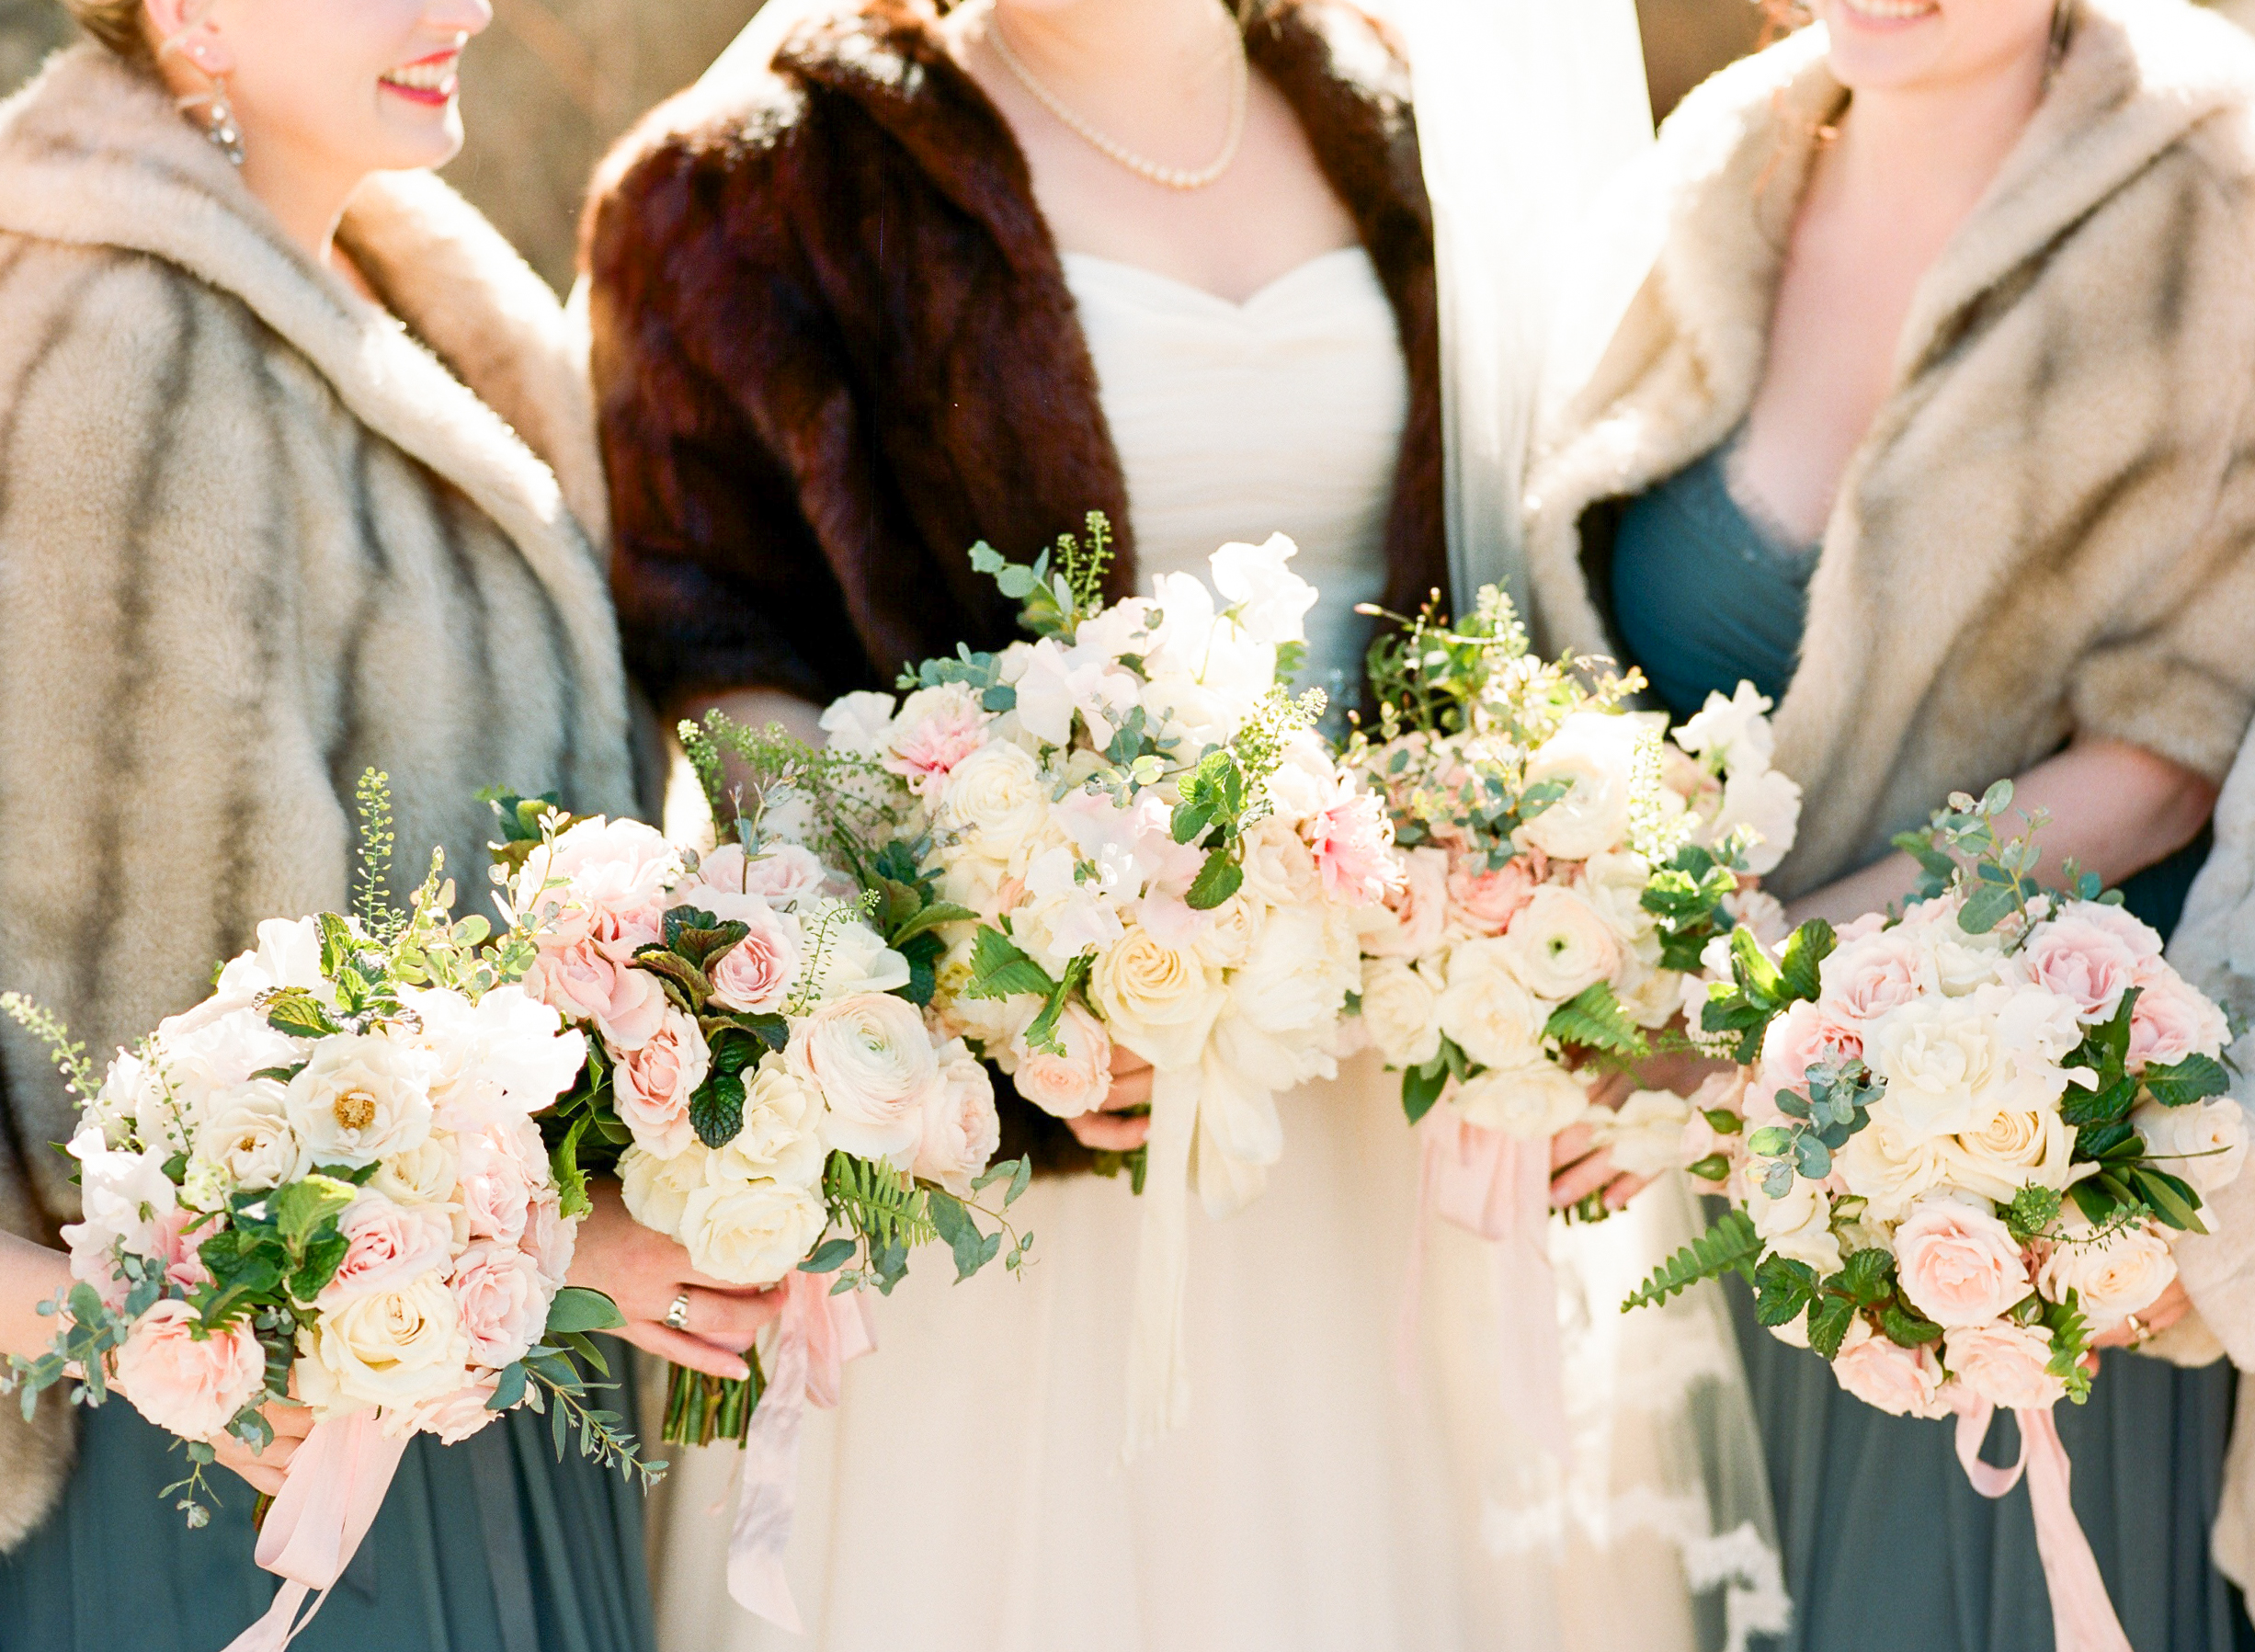 Twin_Owls_Steakhouse-wedding_photographer_Estes_Park_Lisa_ODwyer-213.jpg